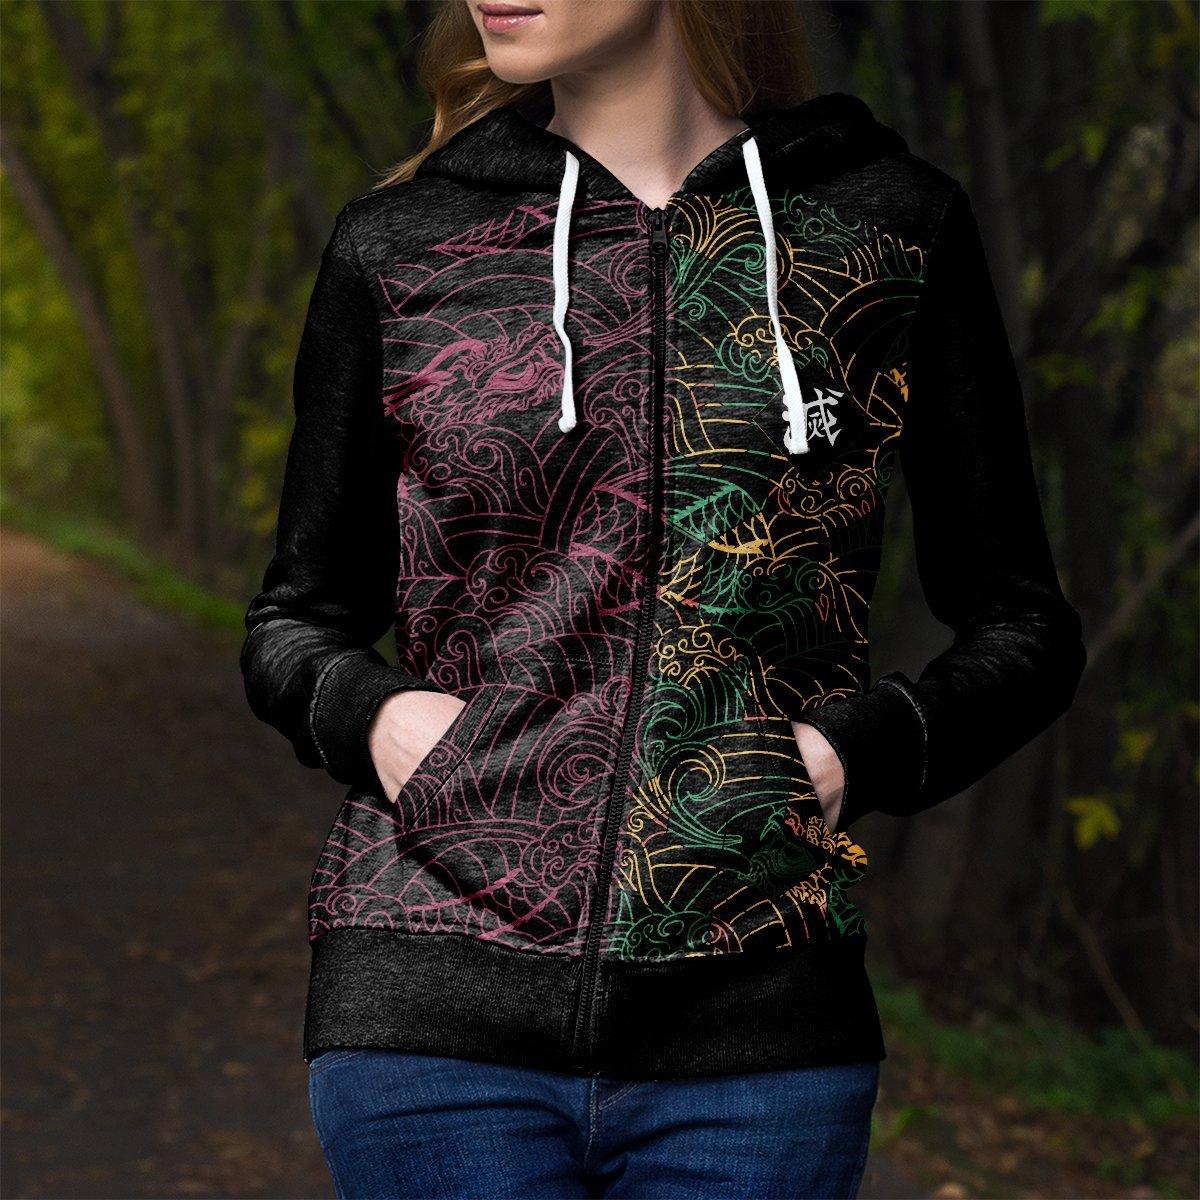 personalized tomioka giyu unisex zipped hoodie 542523 - Otaku Treat